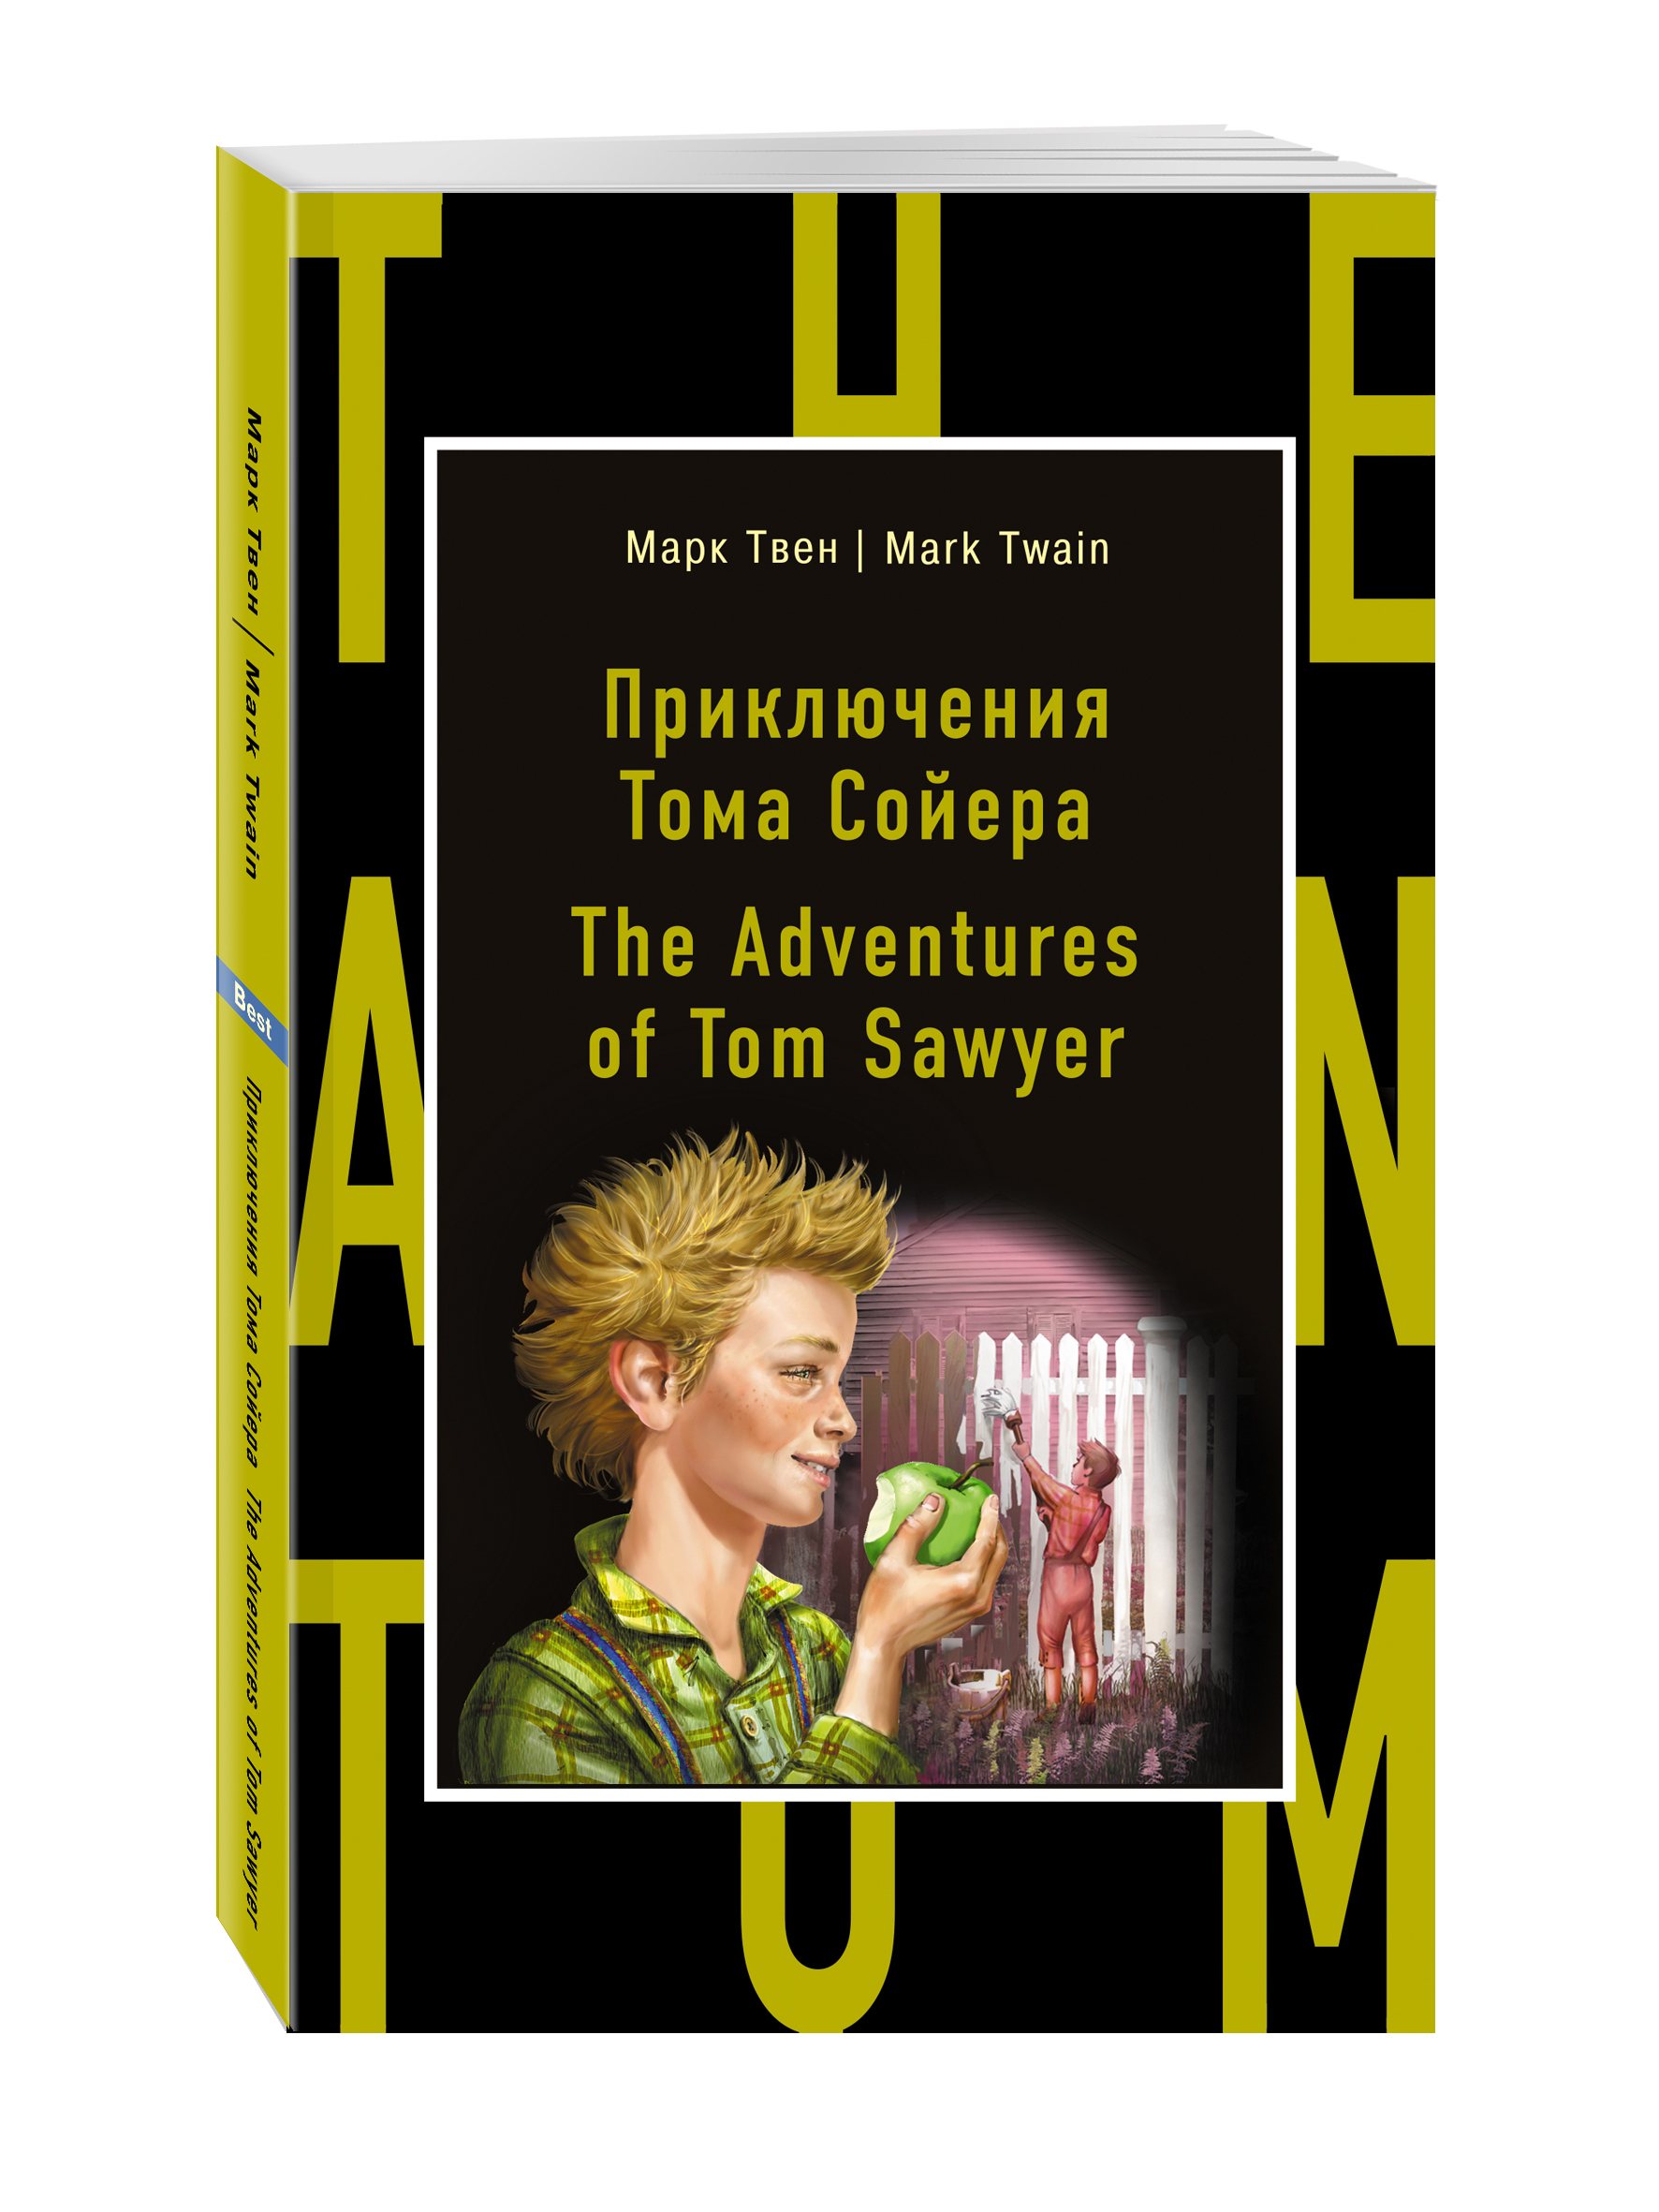 Твен М. Приключения Тома Сойера = The Adventures of Tom Sawyer твен м the adventures of tom sawyer приключения тома сойера